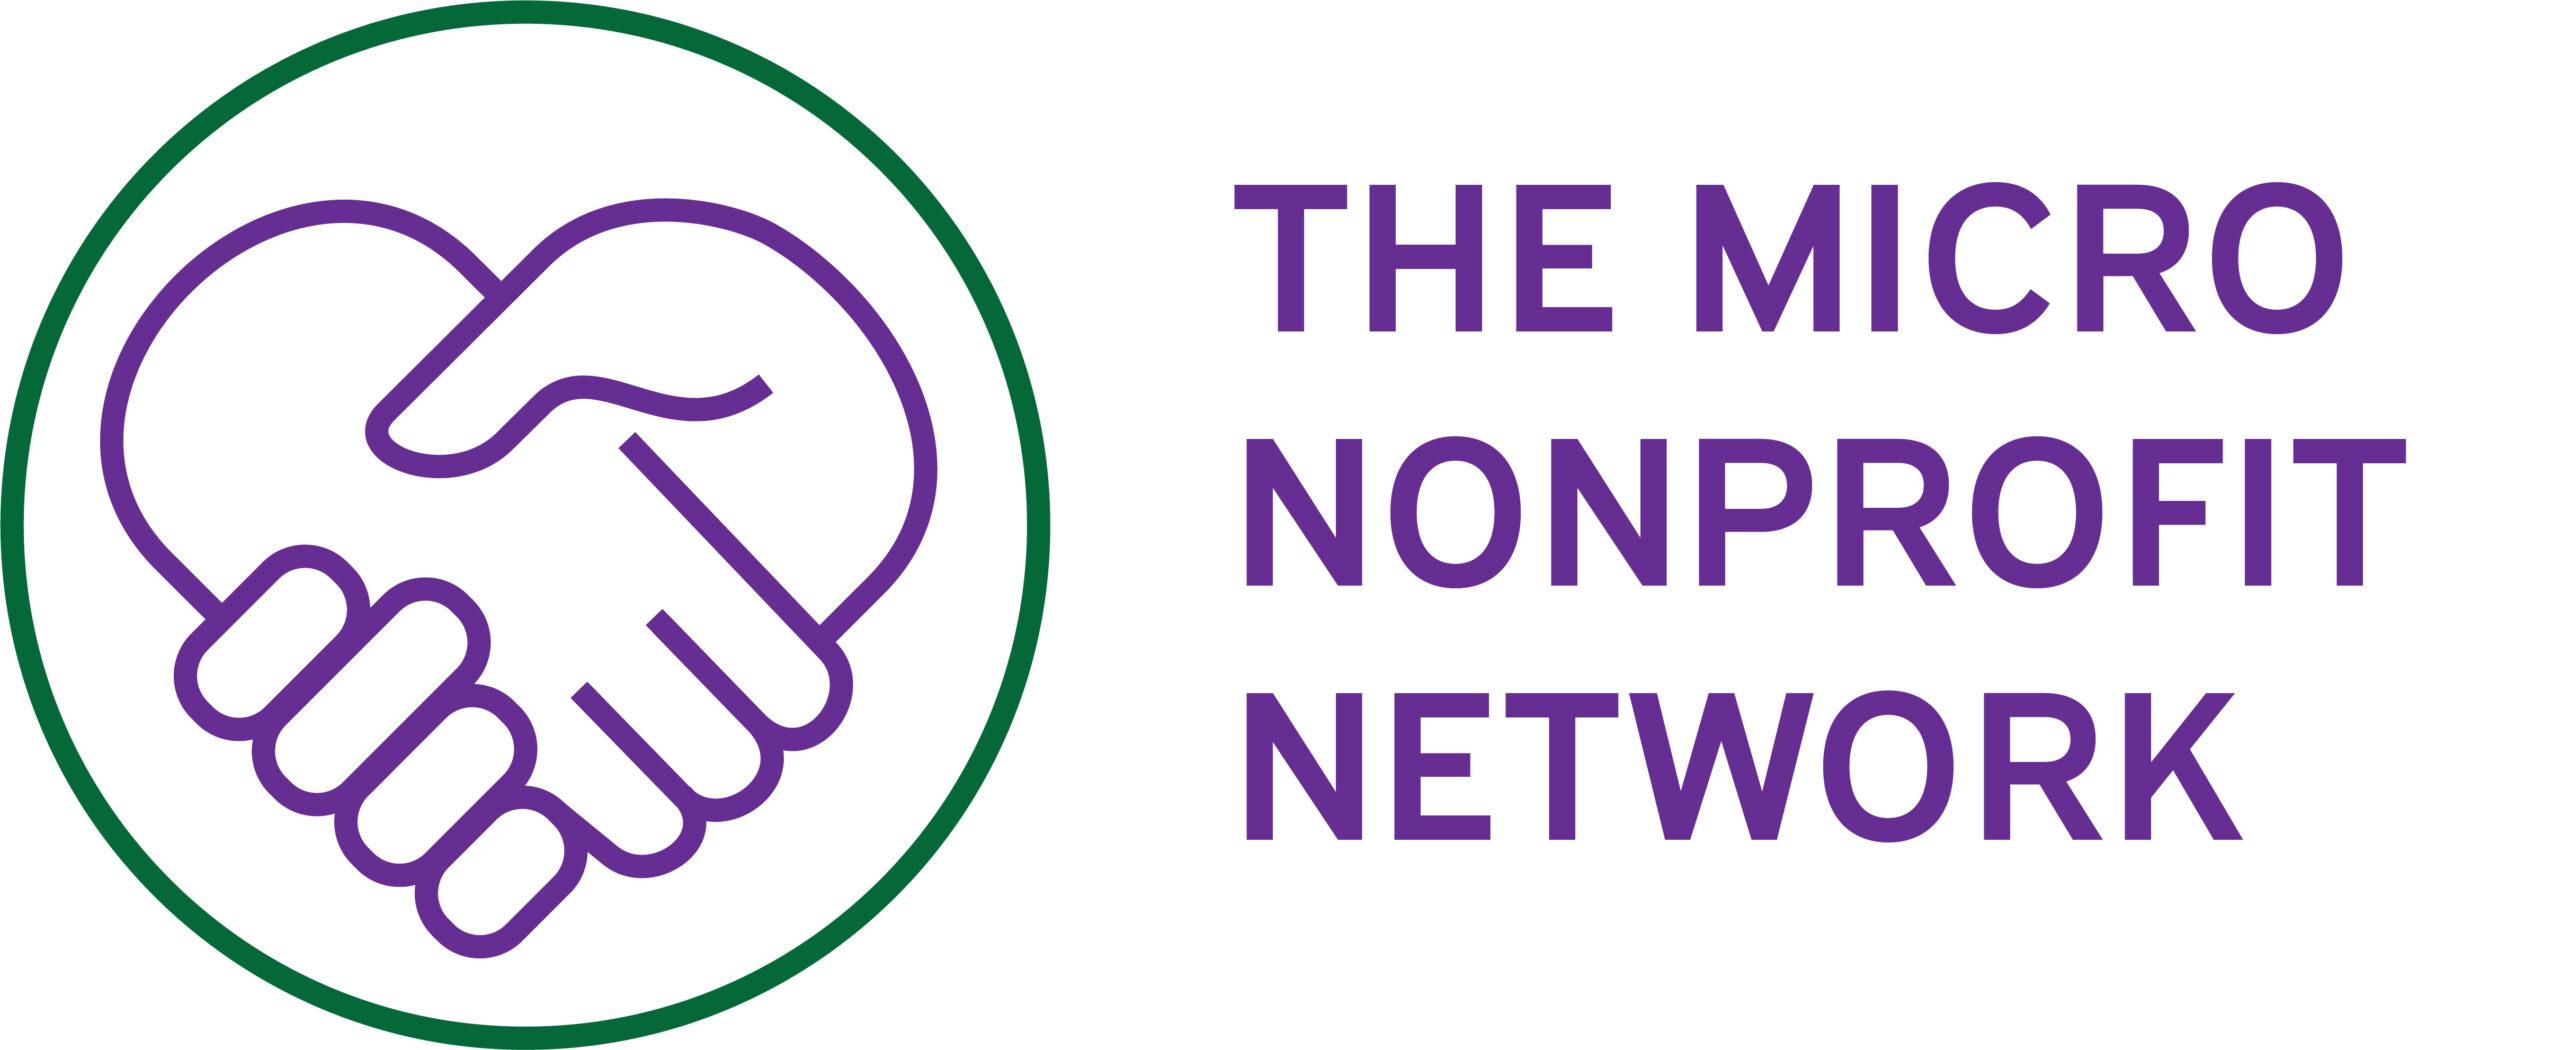 Micro Nonprofit Network